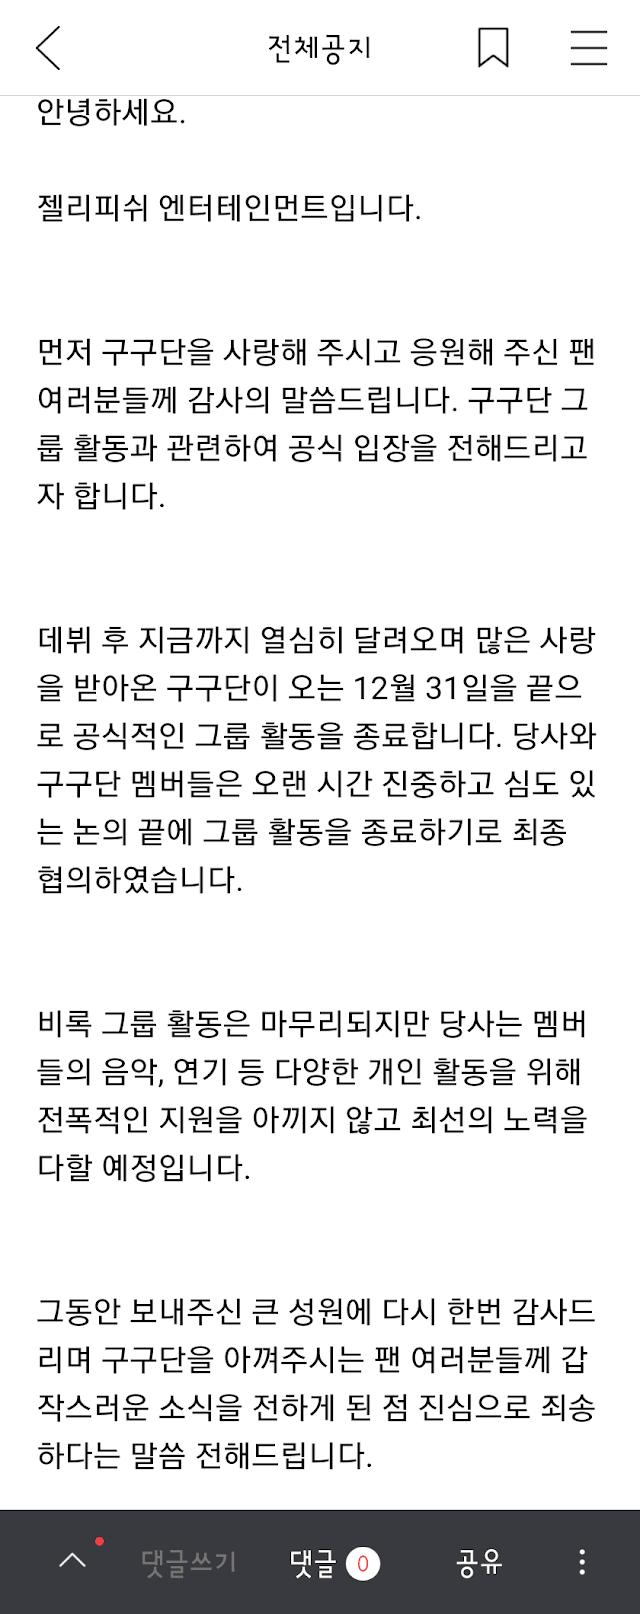 JellyFish Entertainment announced girlgroup GUGUDAN disbandment on December 31, Knetz shares mixed reaction.